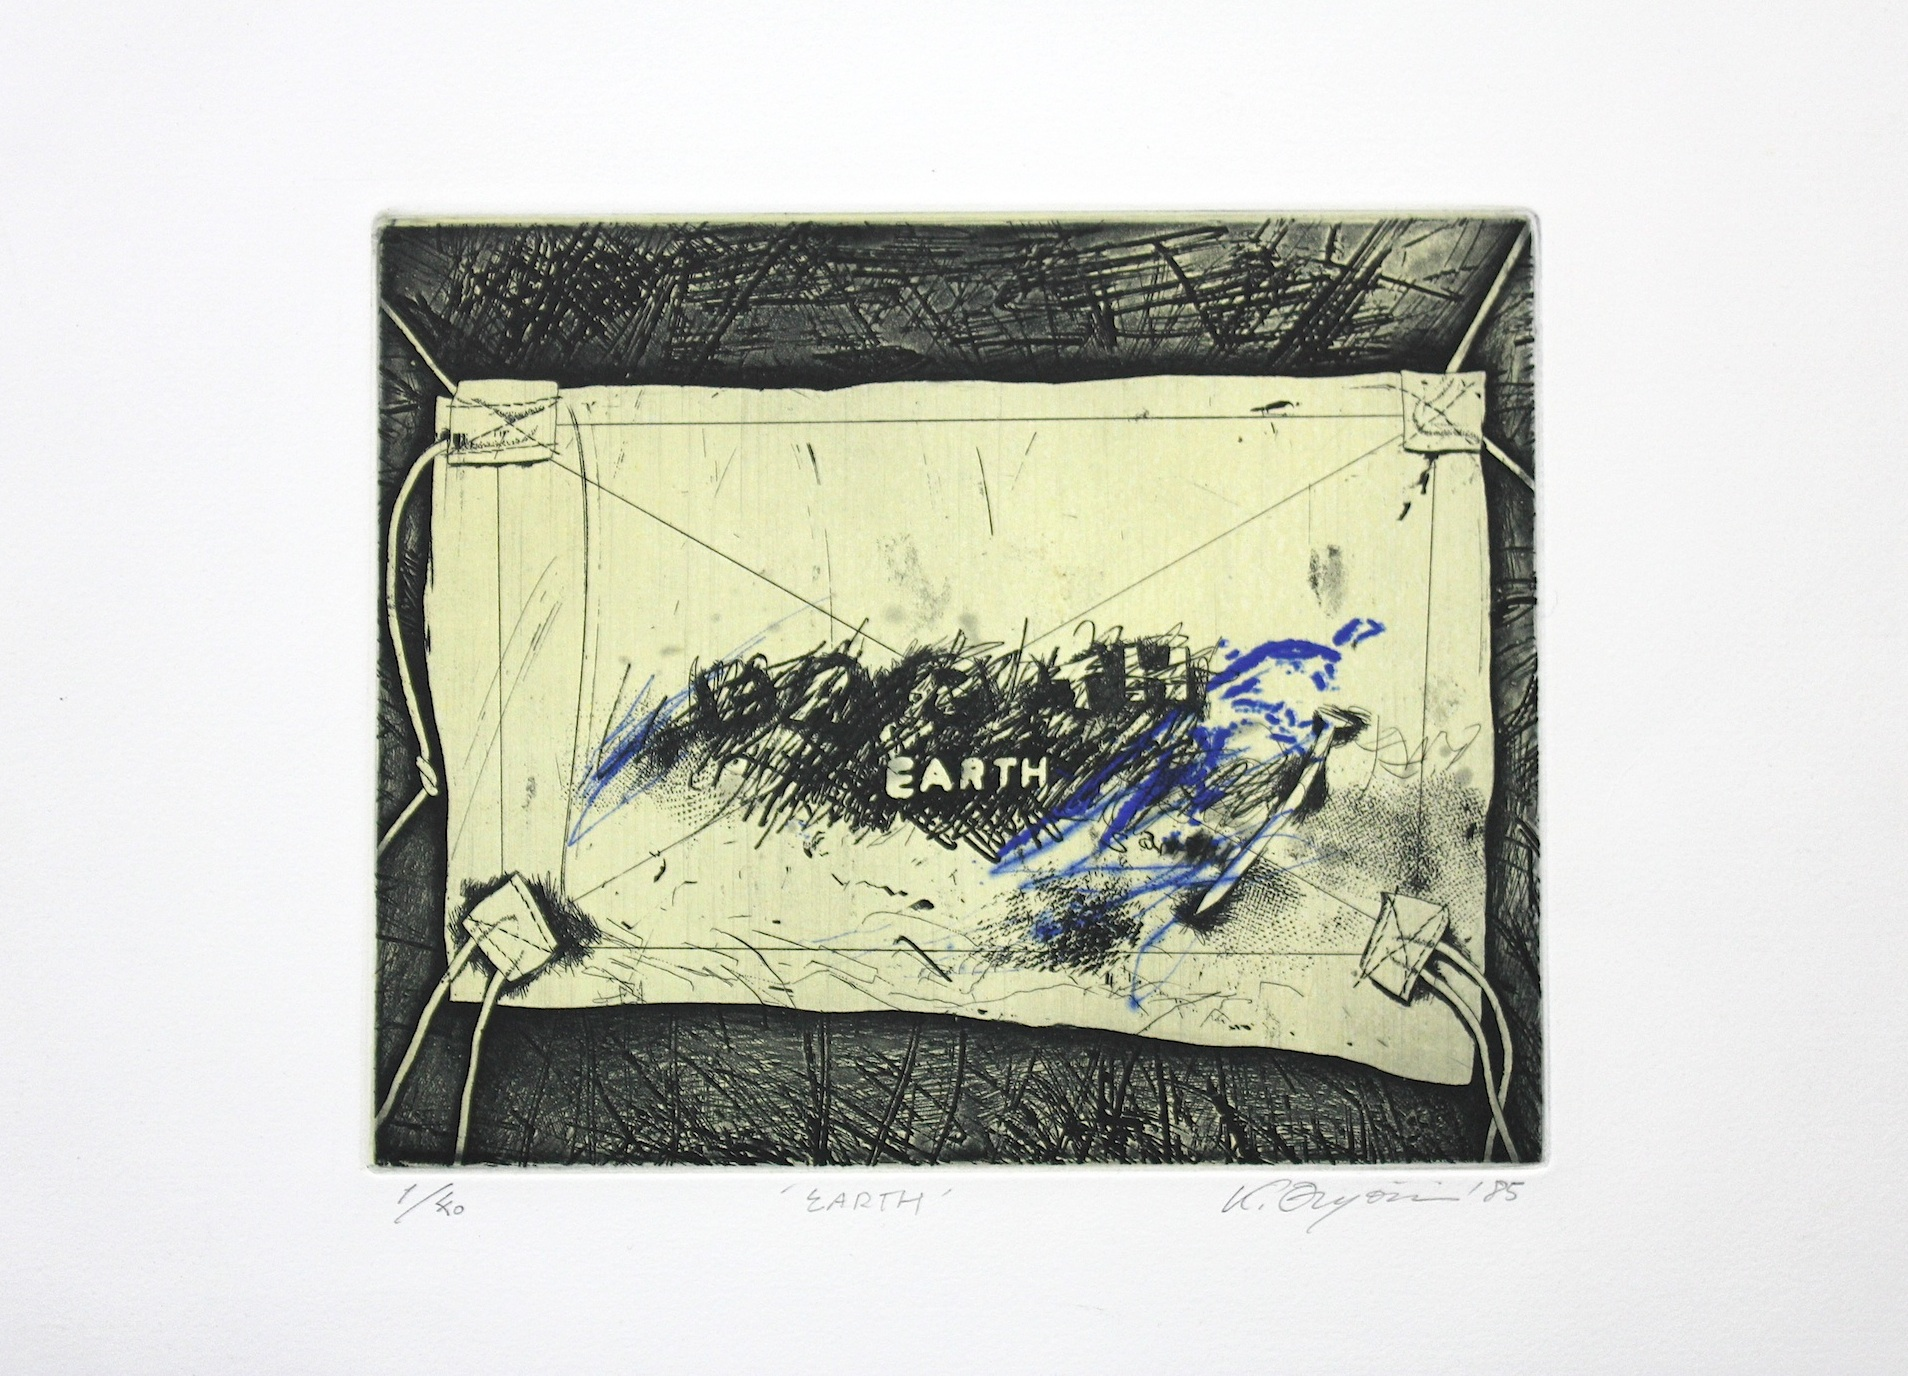 Kenji  Onjyoji  /  園城寺建治 Earth   銅版画 紙 1985年